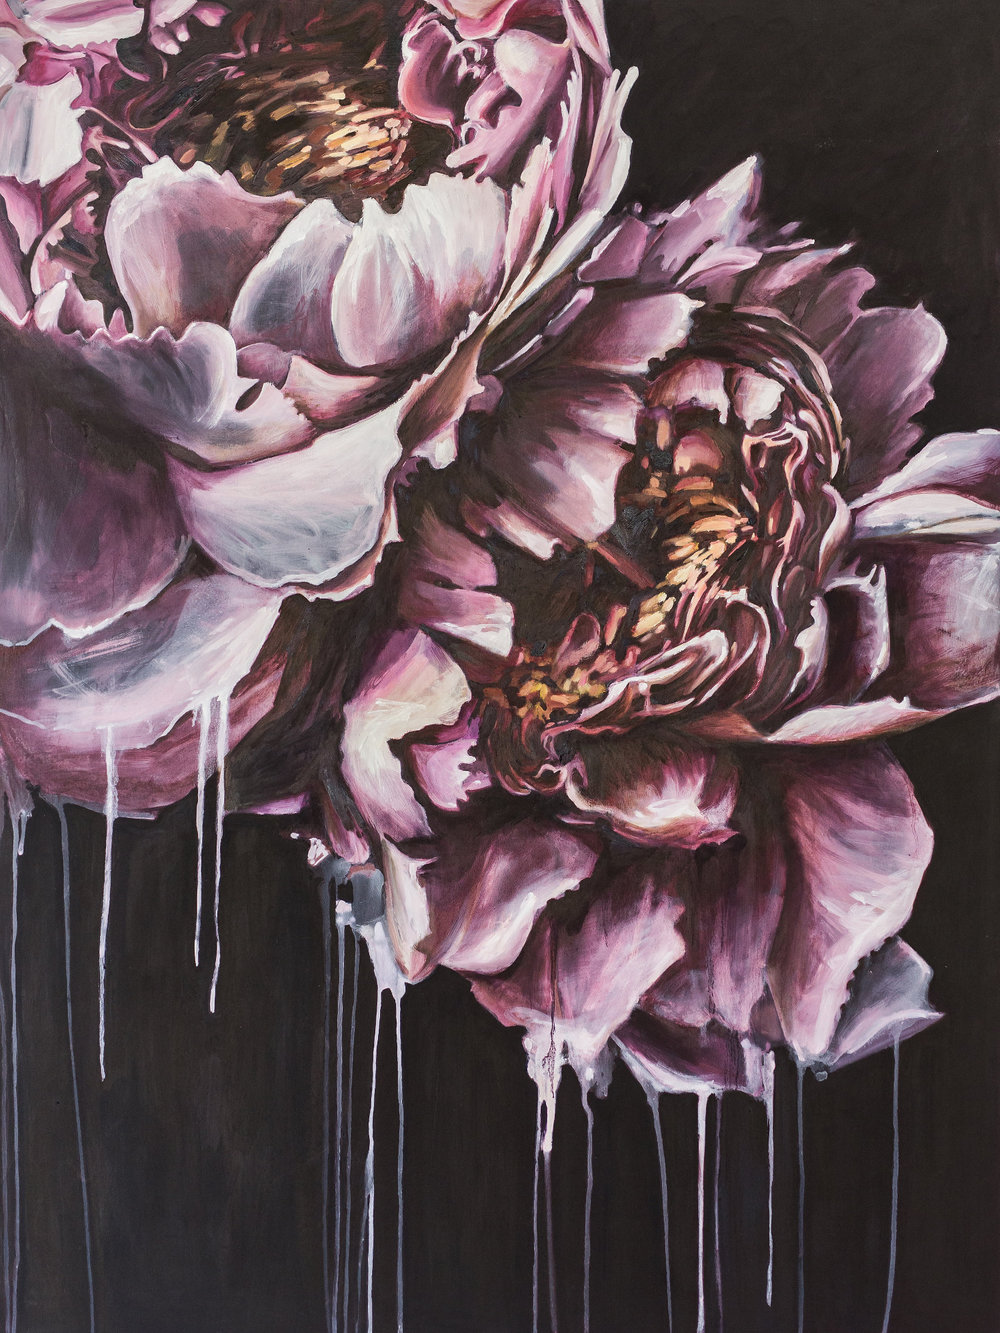 peonies-dripping-melissa-townsend-art.jpg